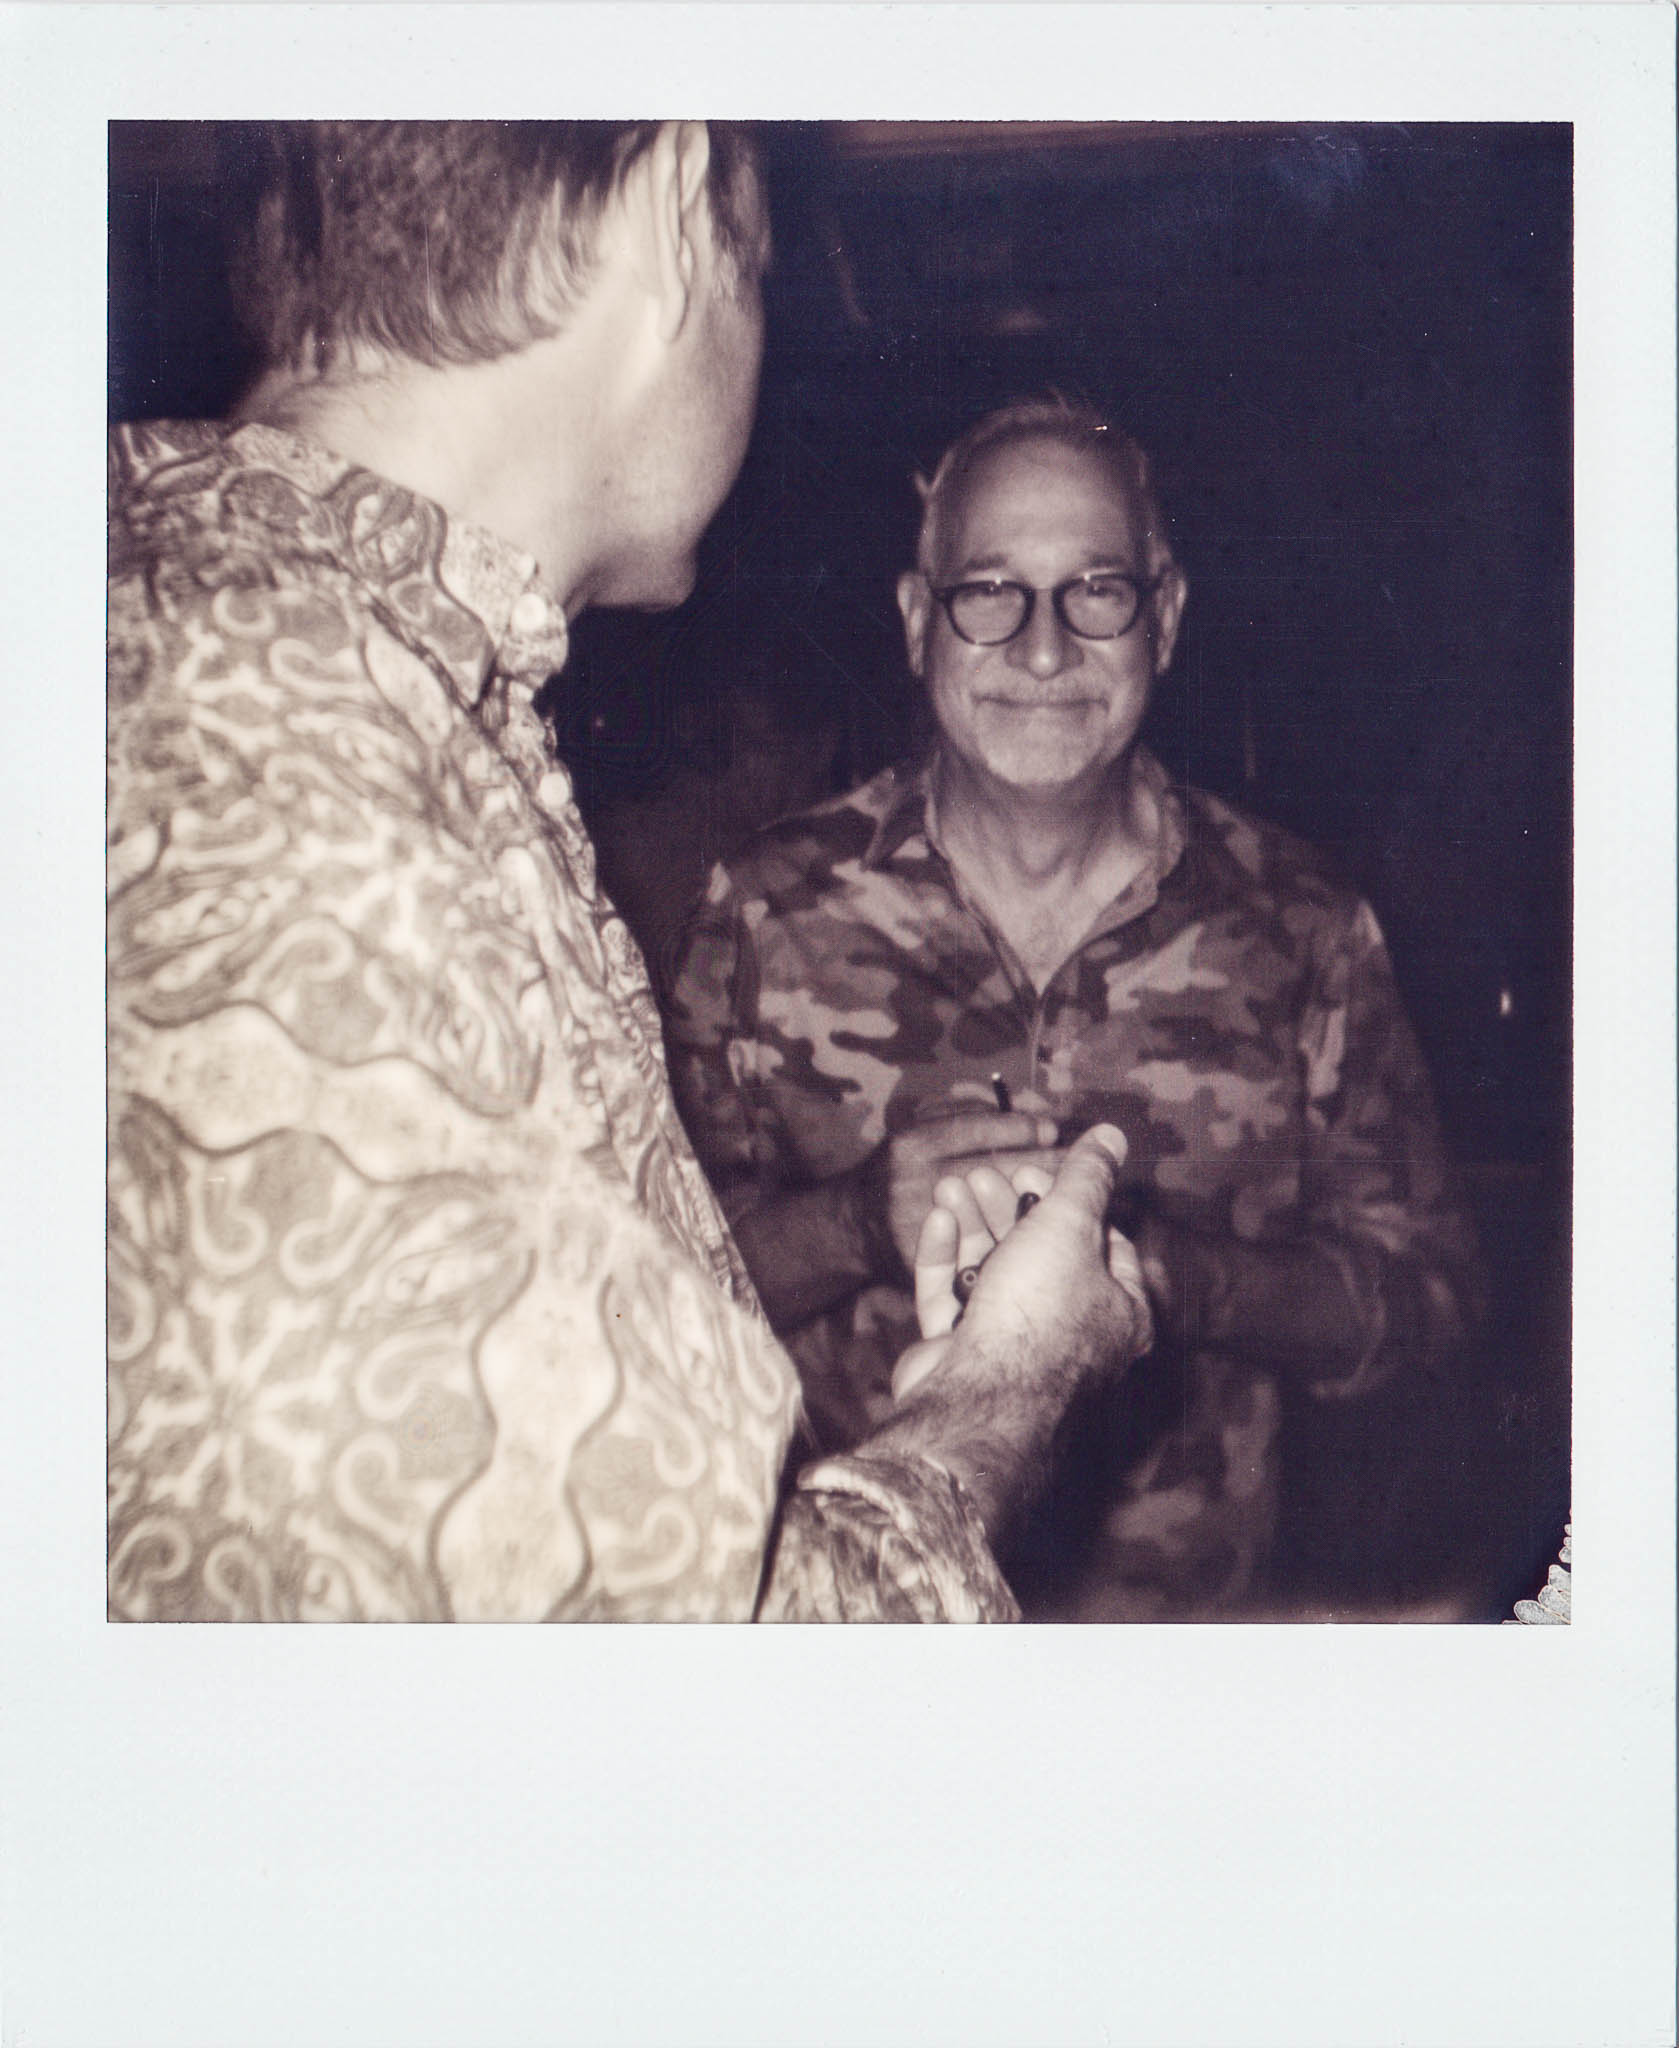 Reid-Pasternack-wallys-polaroid.jpg